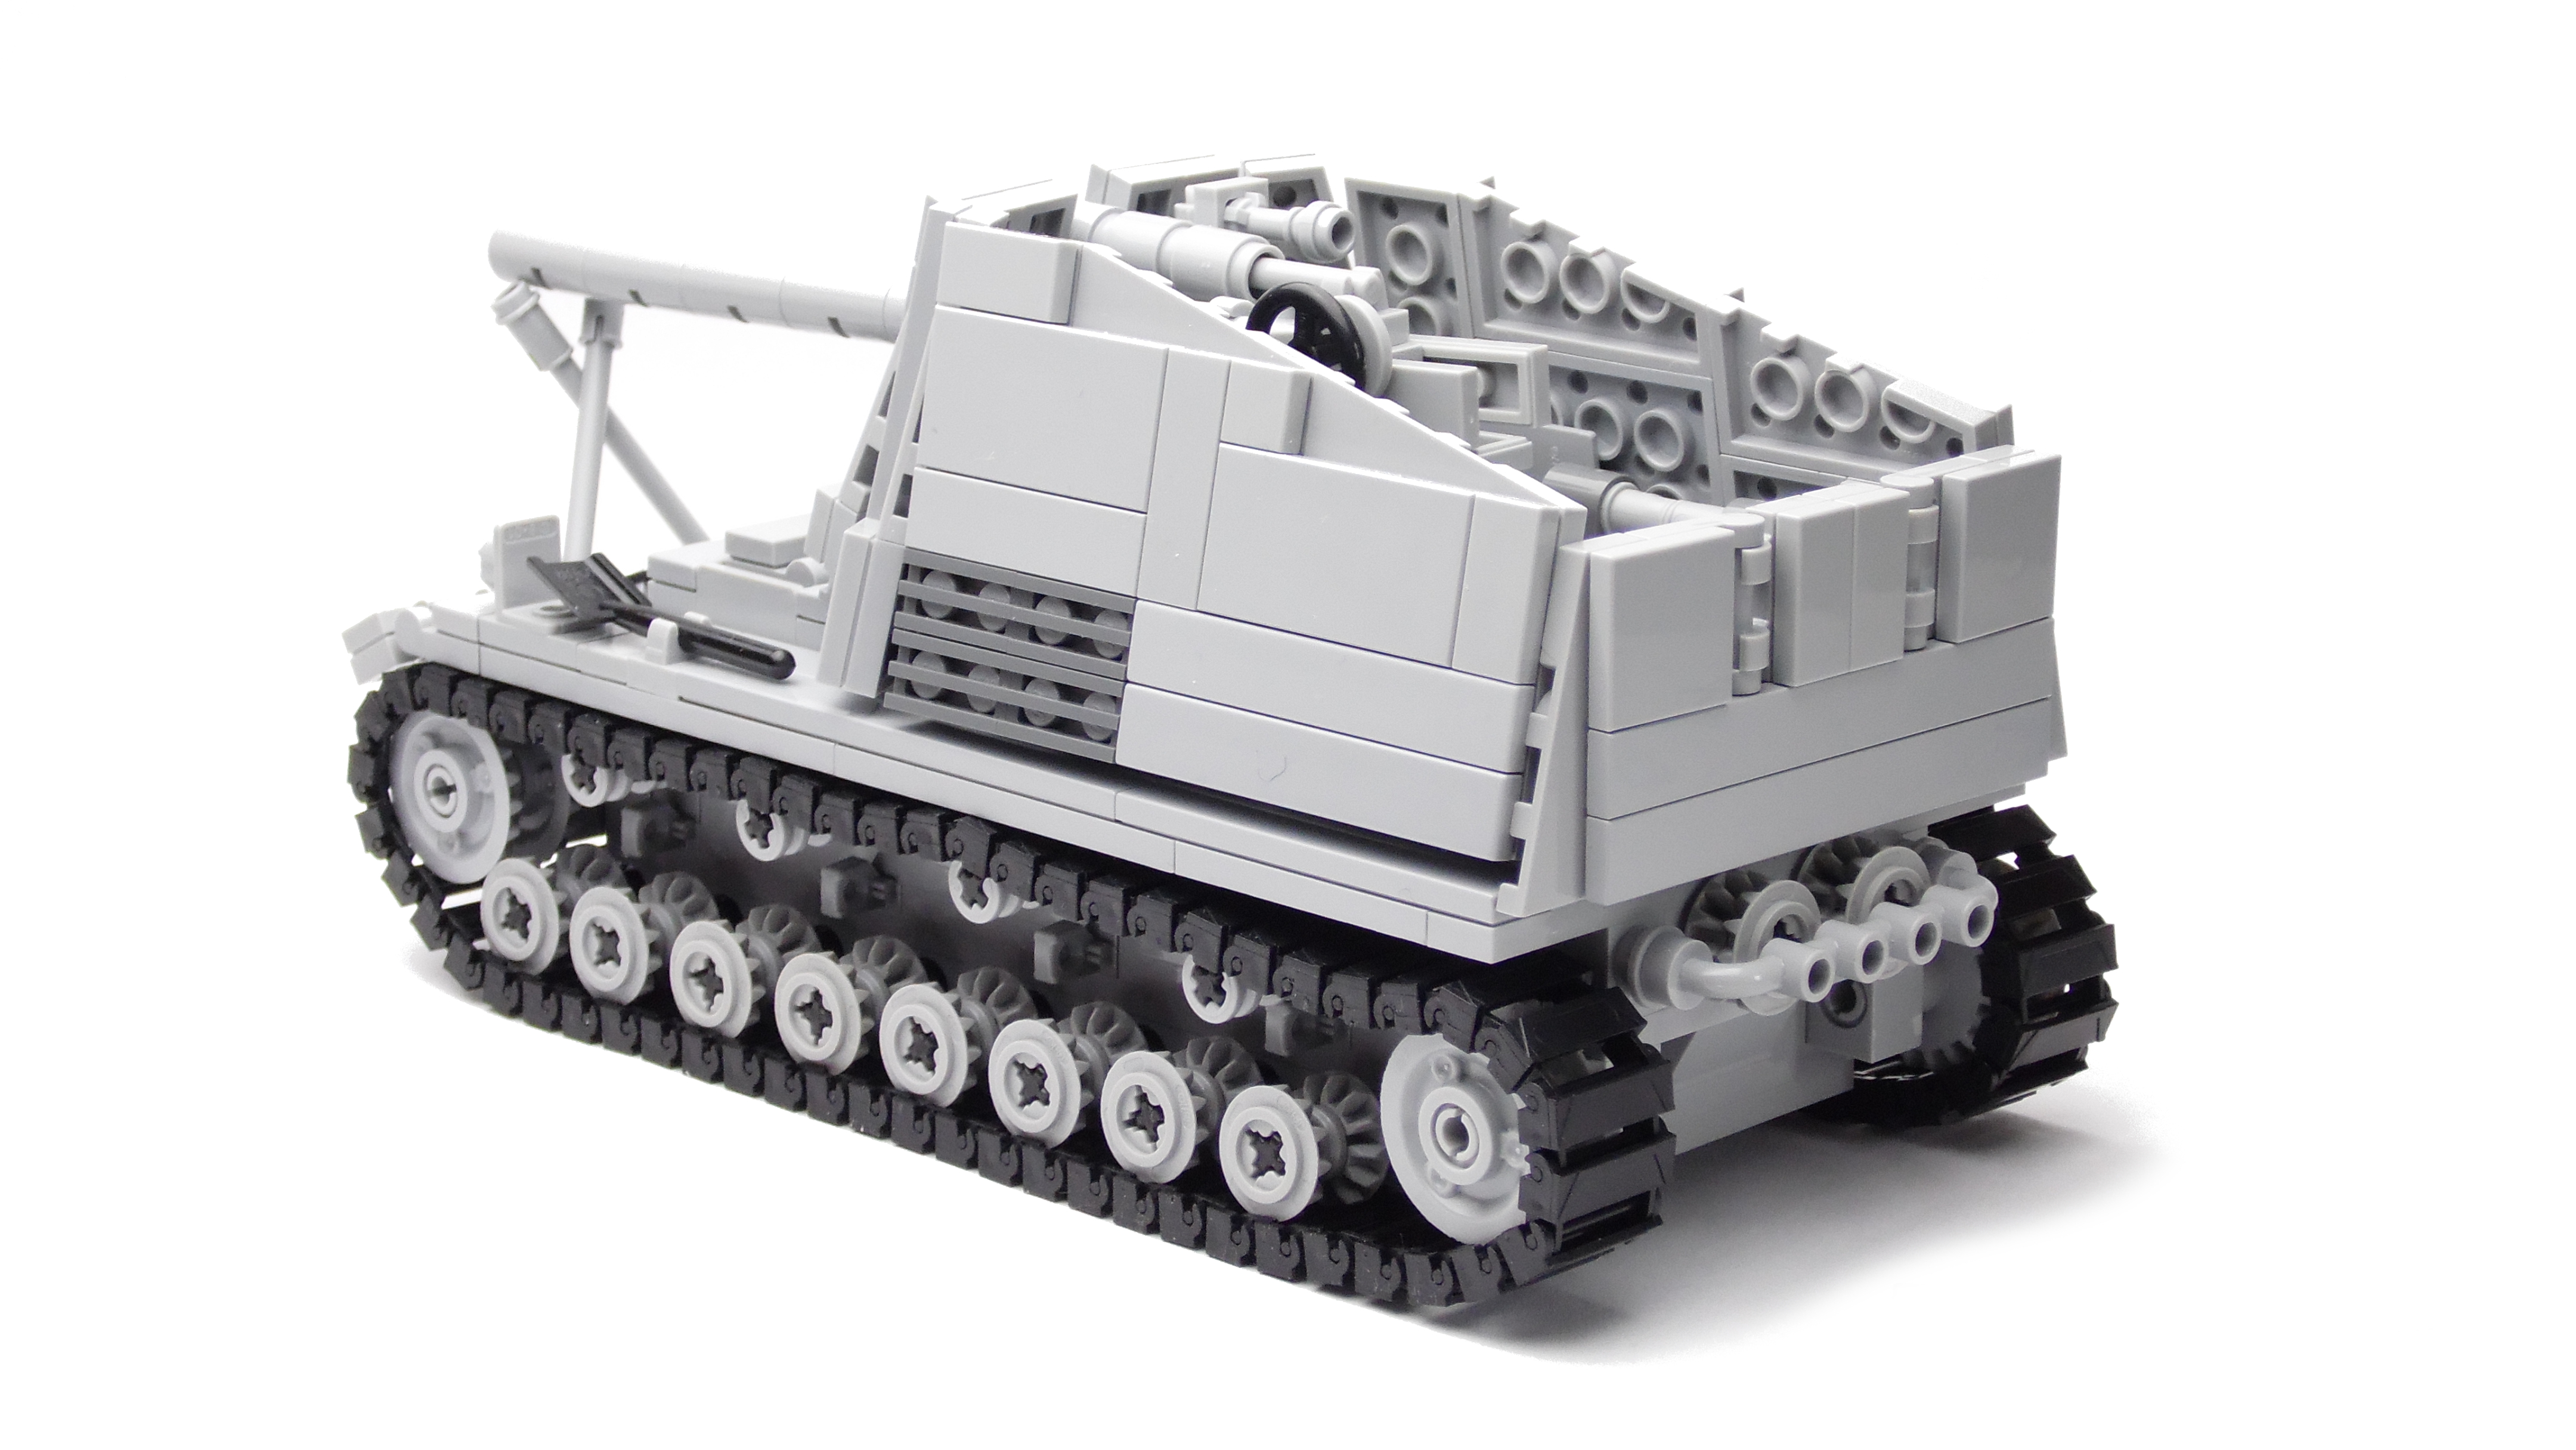 Bauplan Panzerhaubitze IV Hummel Modellbauplan